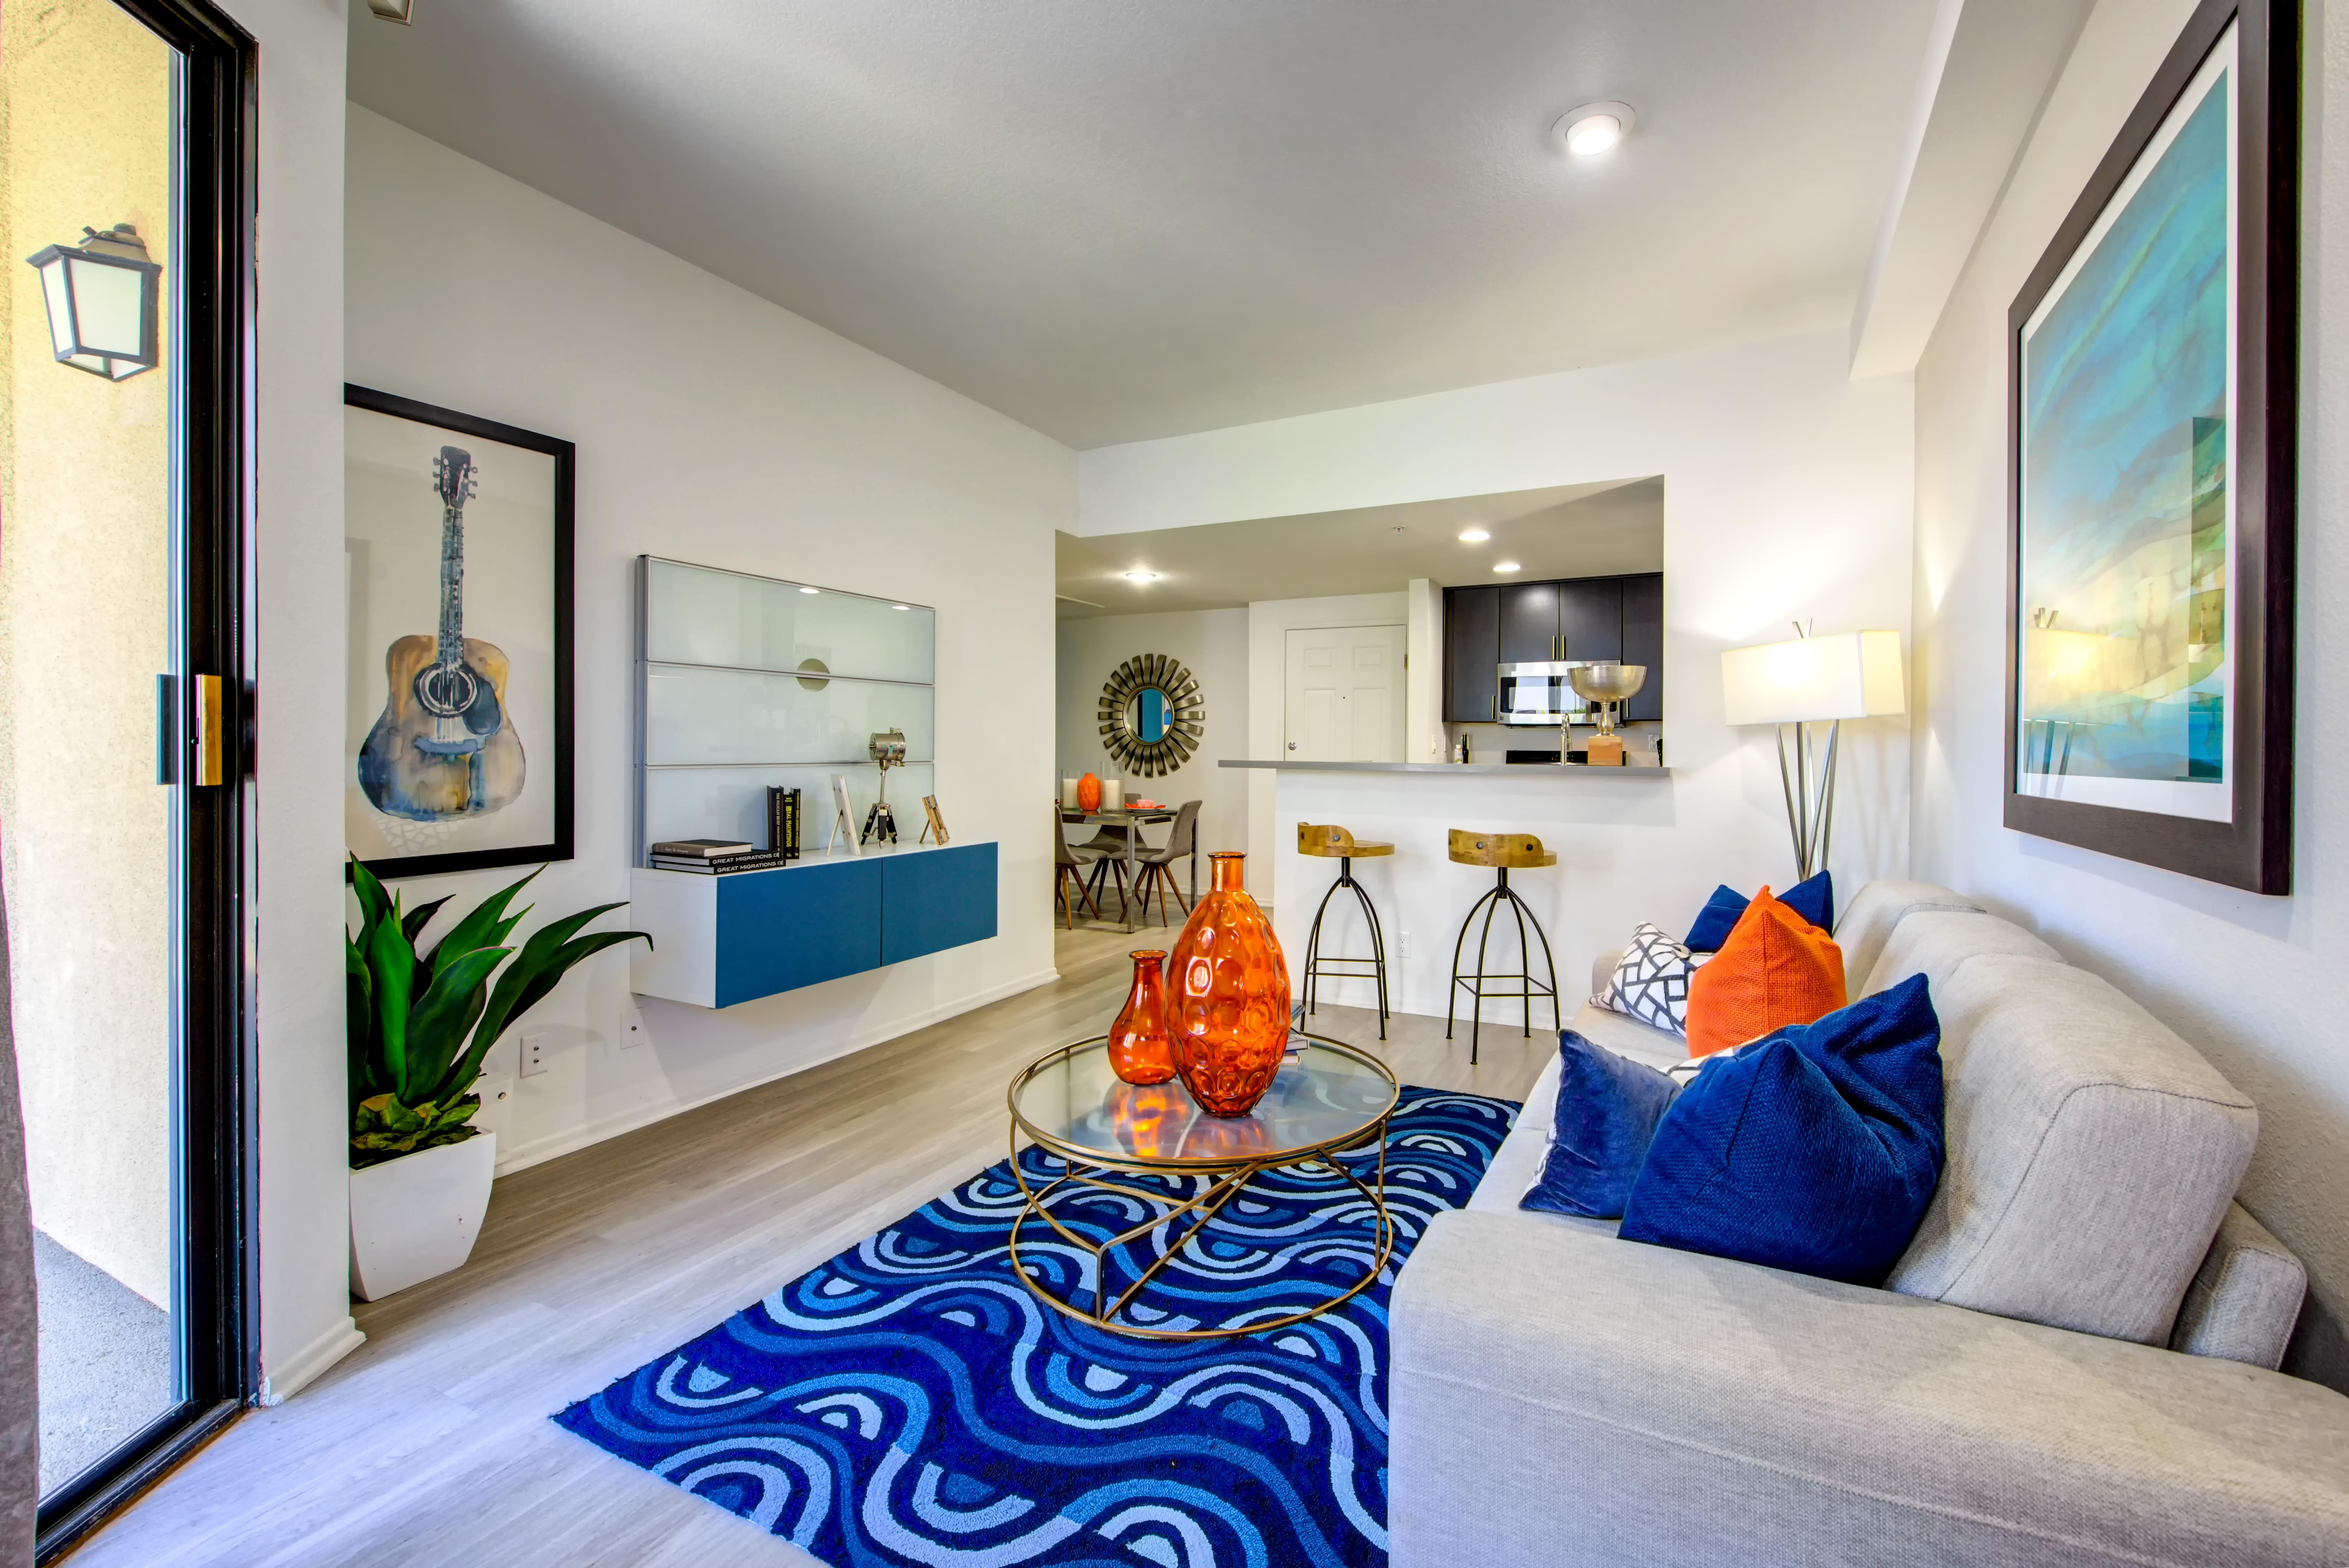 Living Room at Sofi at 3rd in Long Beach, CA